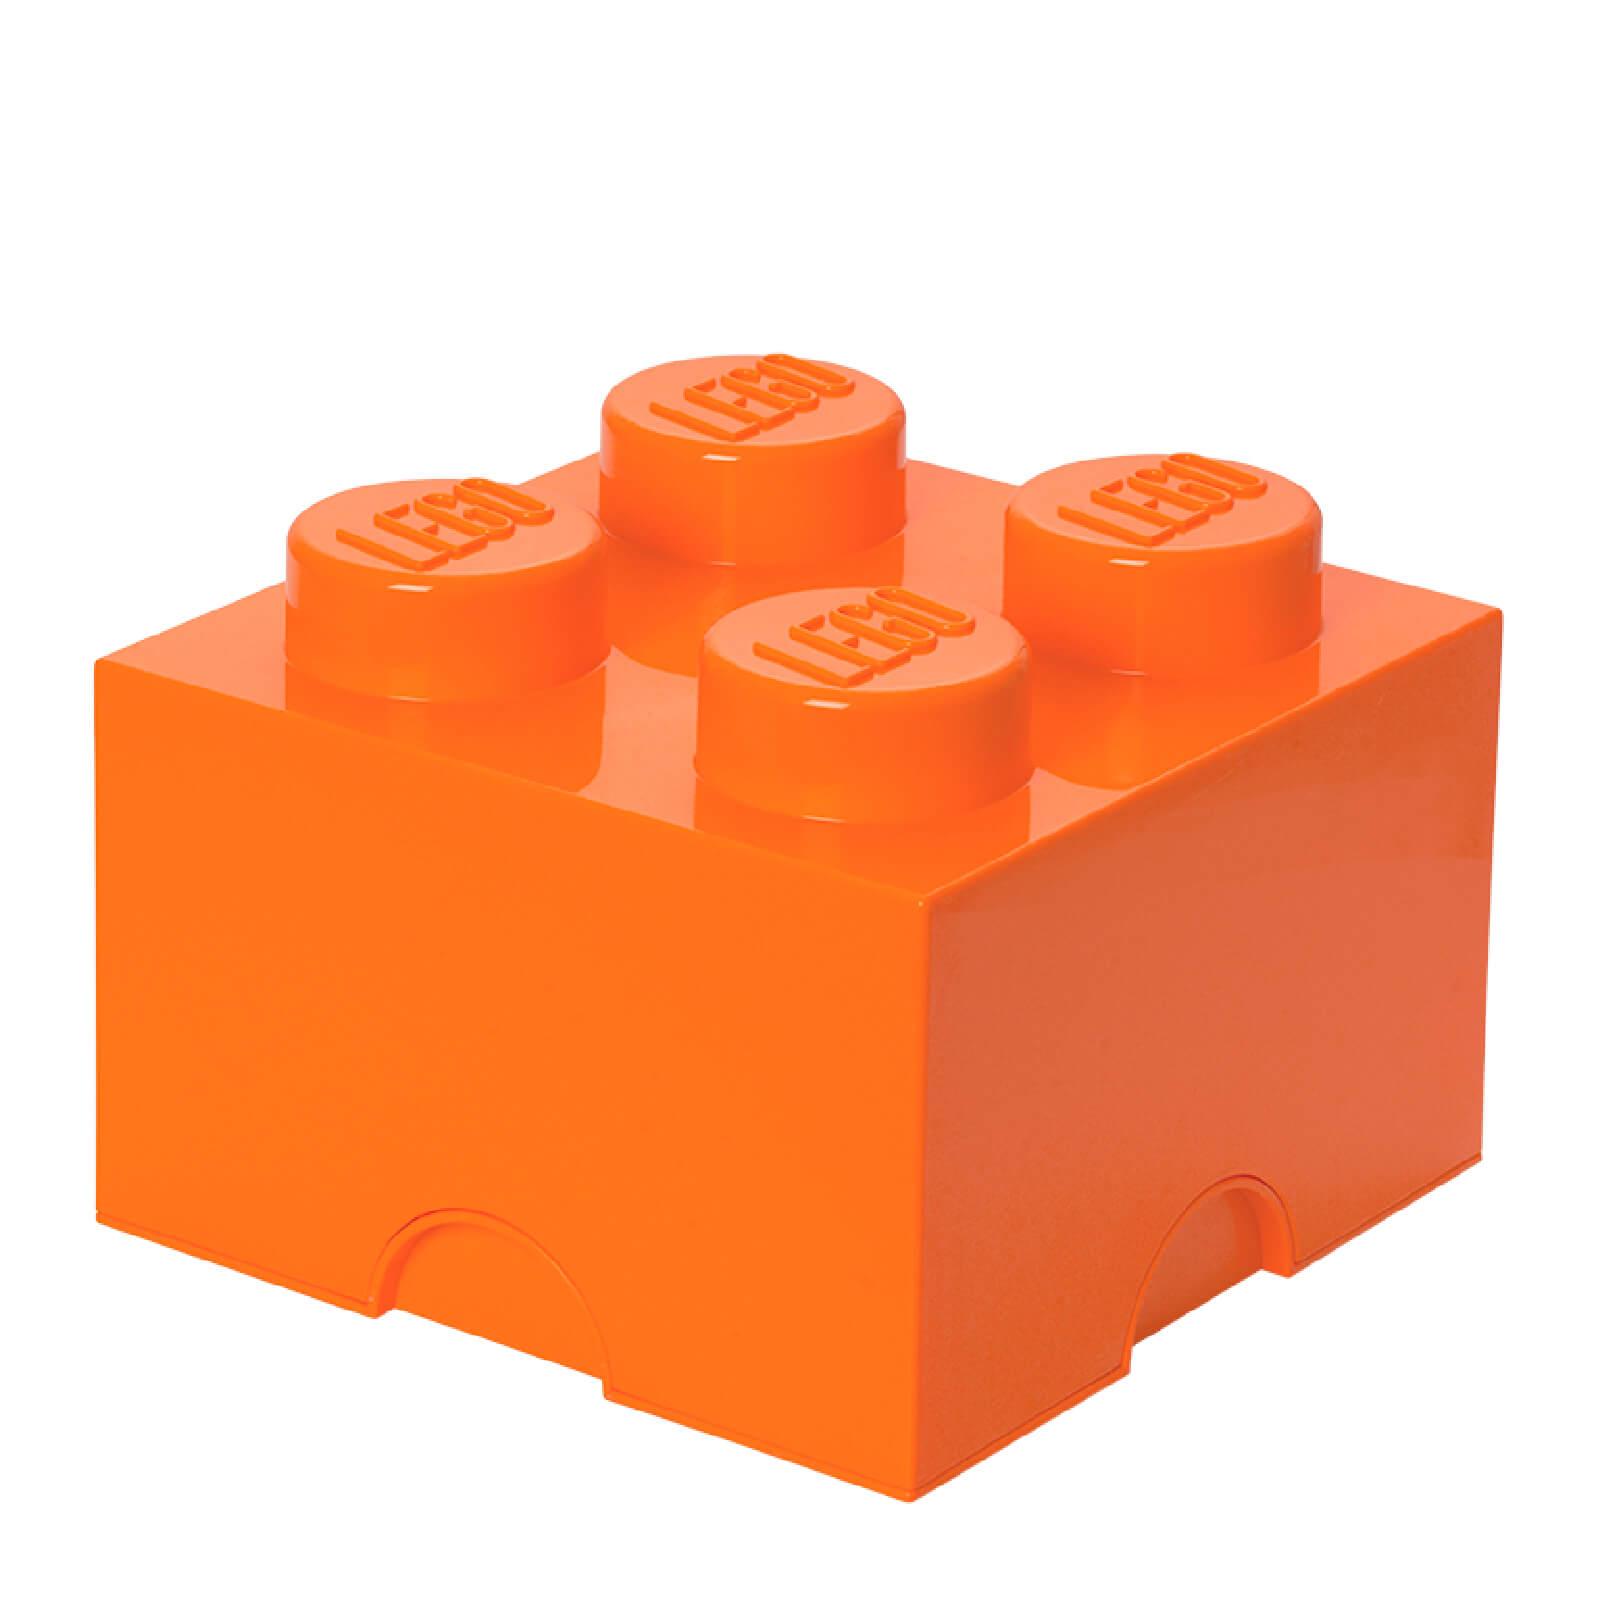 Lego Storage Brick 4 - Bright Orange